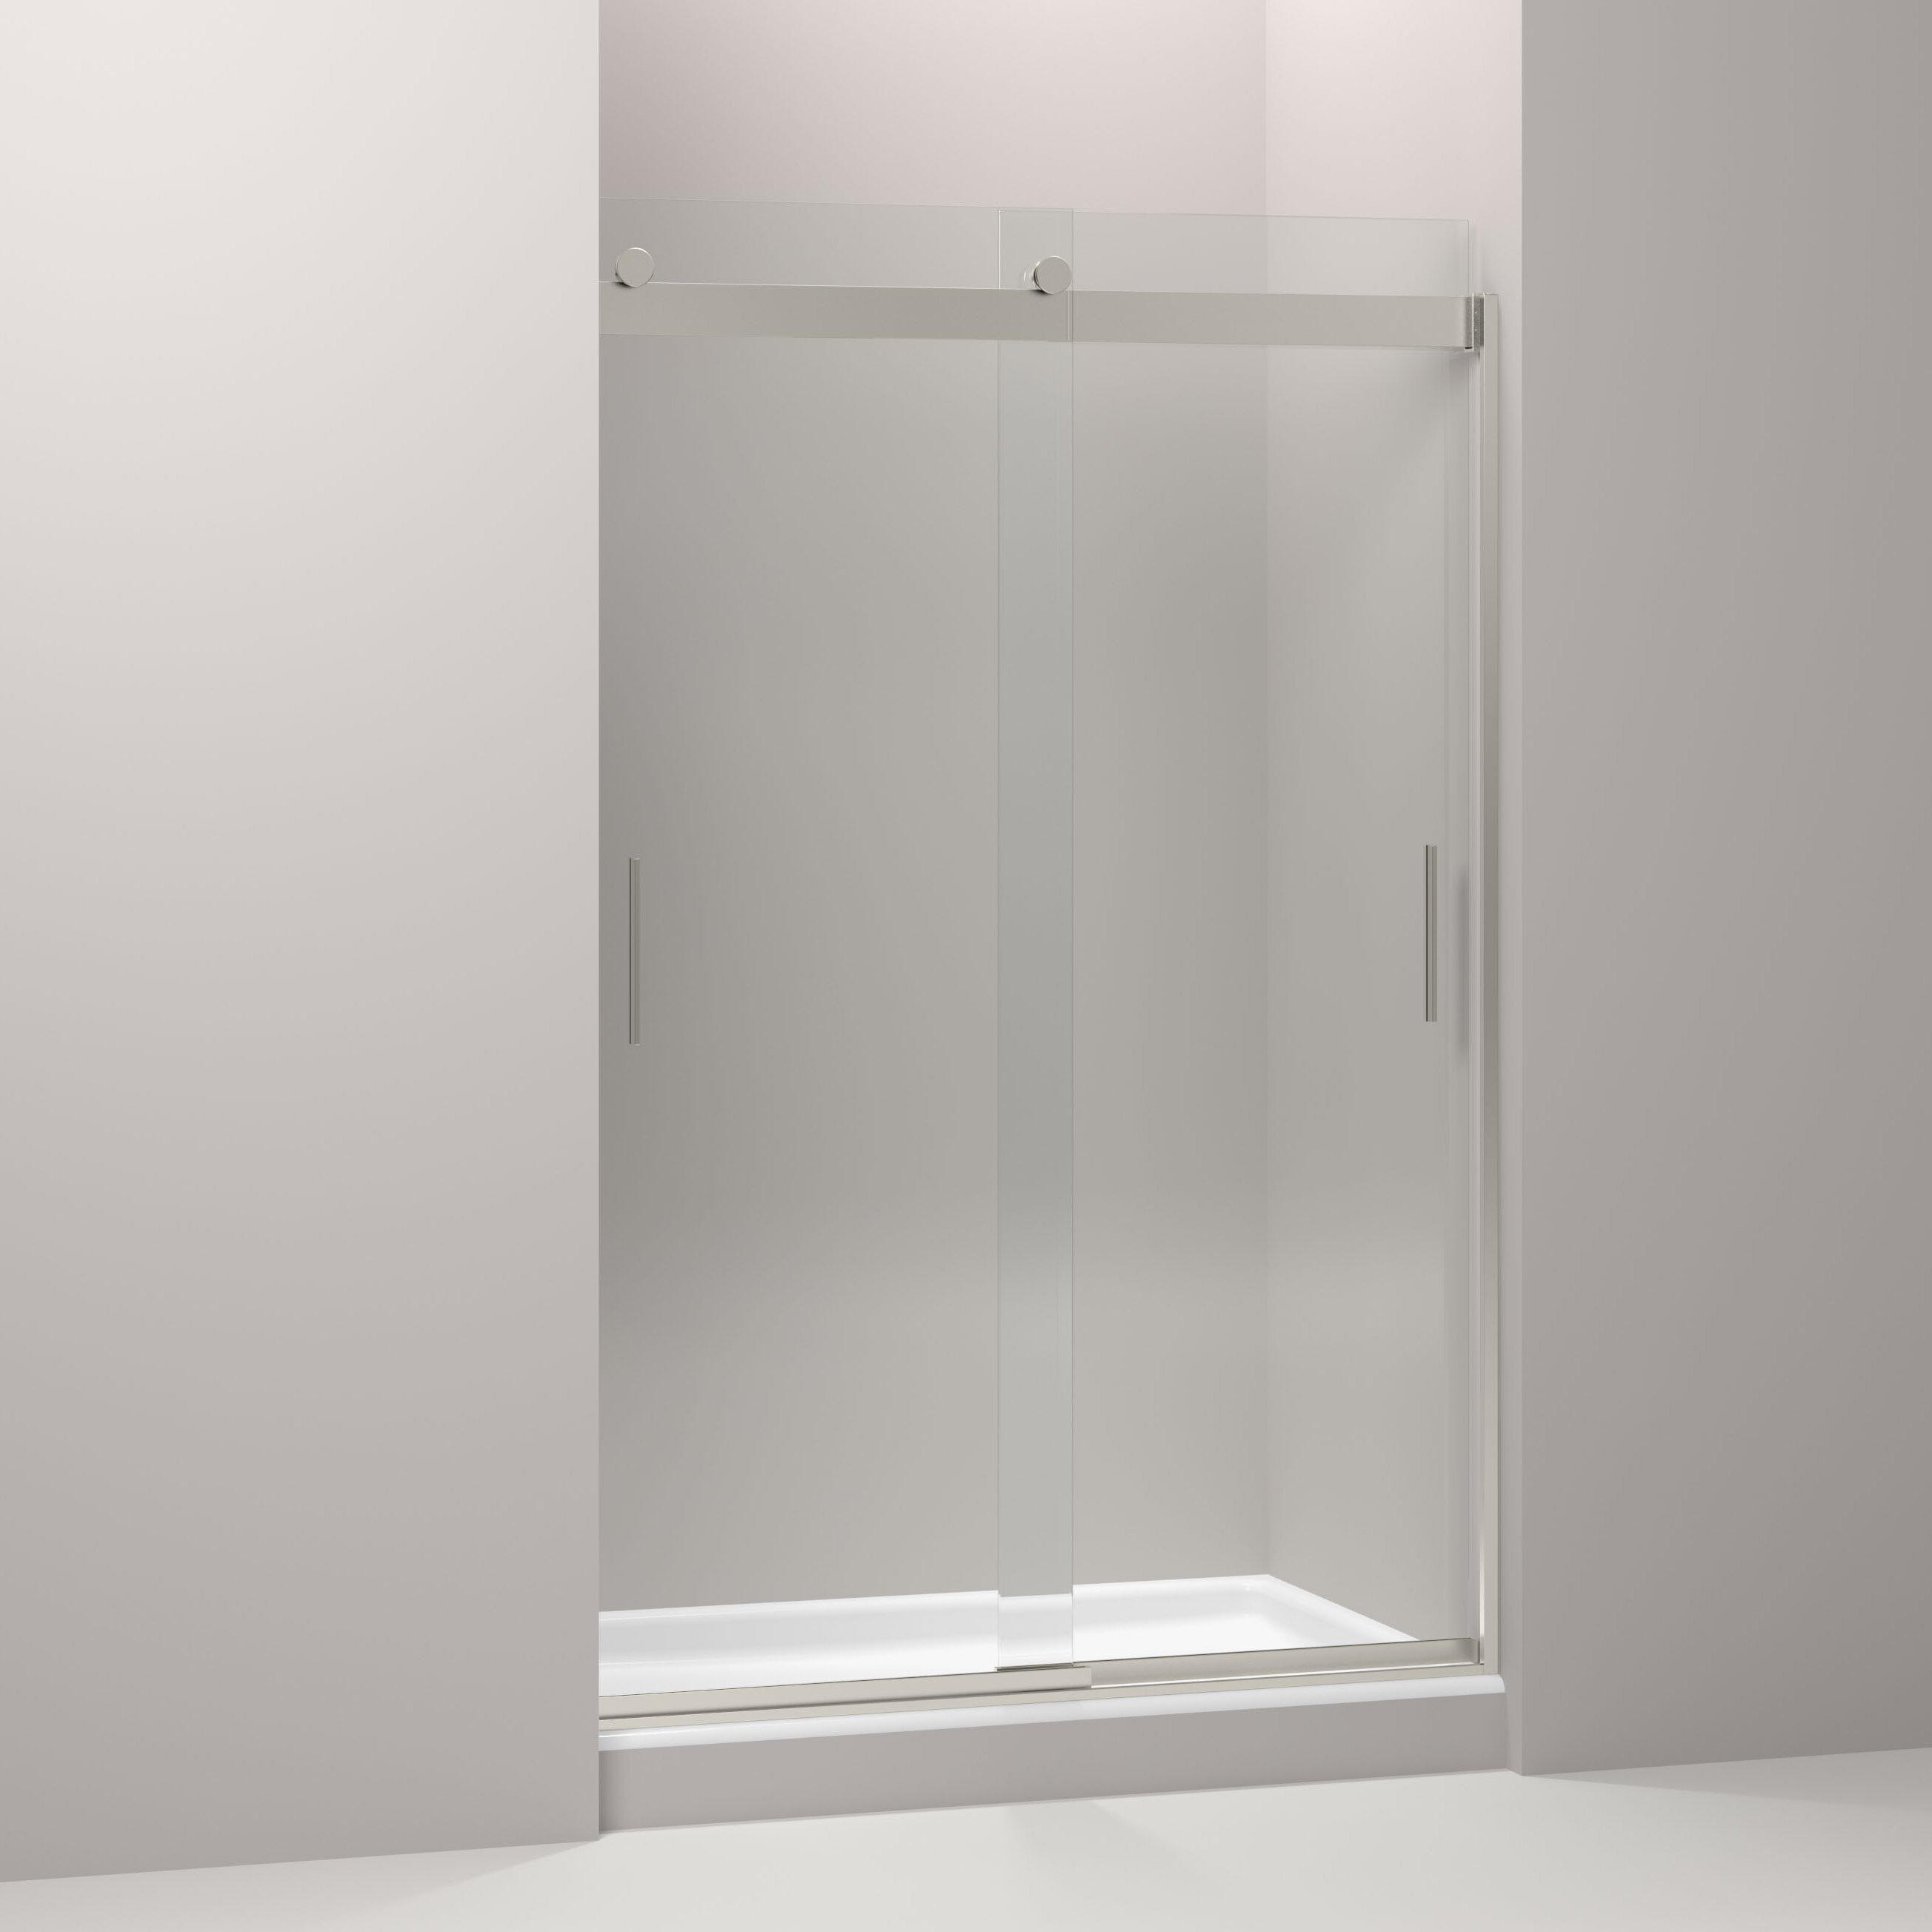 K 706008 L Abvmxsh Kohler Levity 4758 X 74 Bypass Shower Door